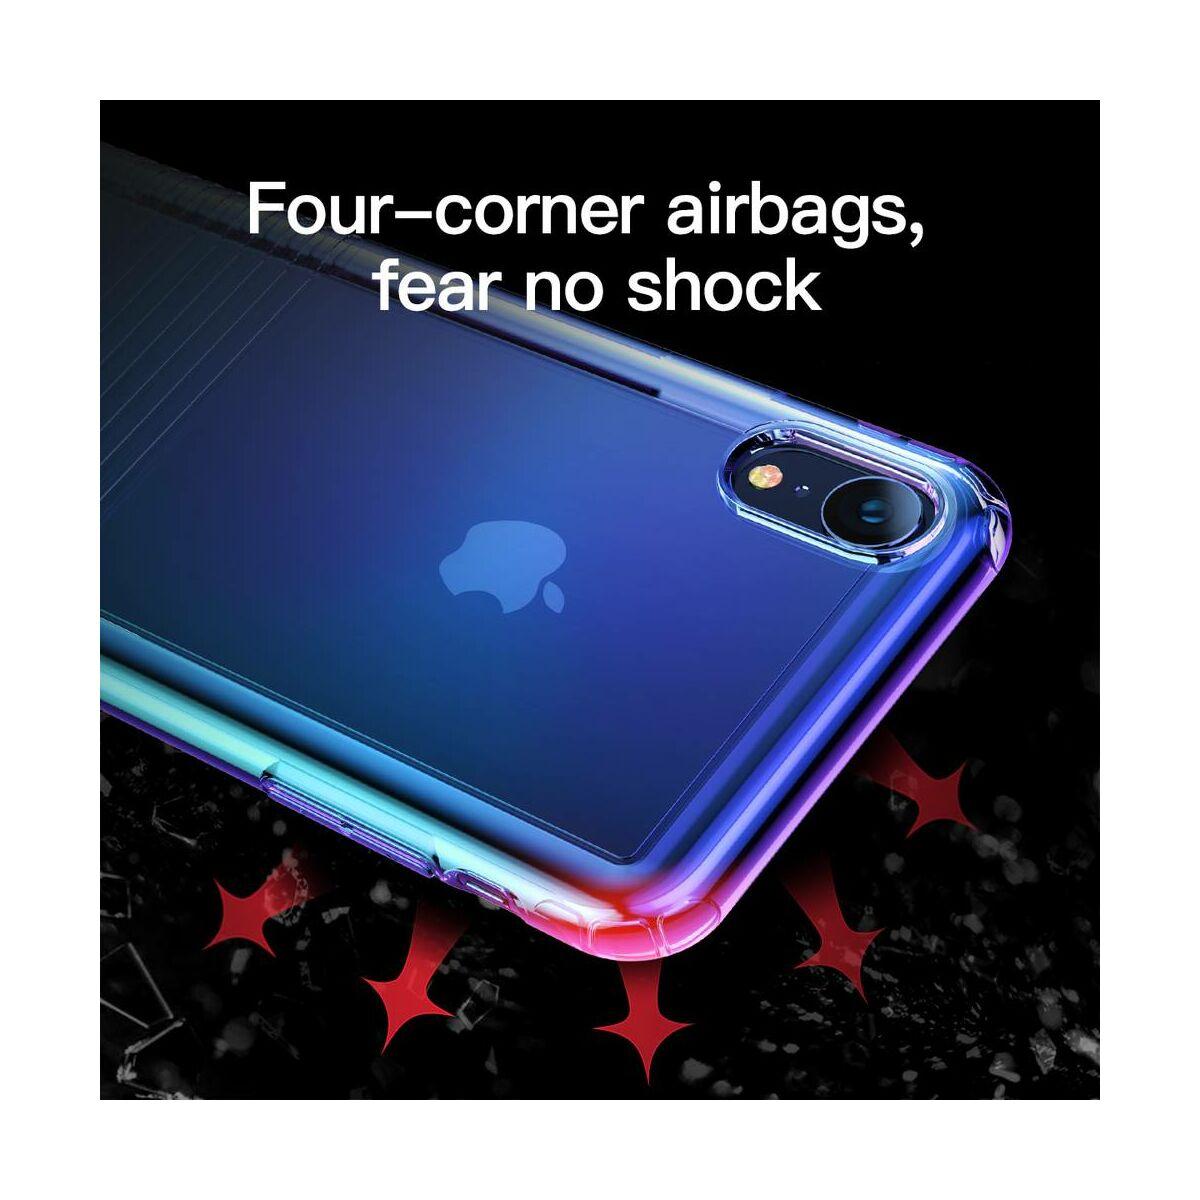 Baseus iPhone XR tok, Colorful Airbag védelem, rózsaszín (WIAPIPH61-XC04)